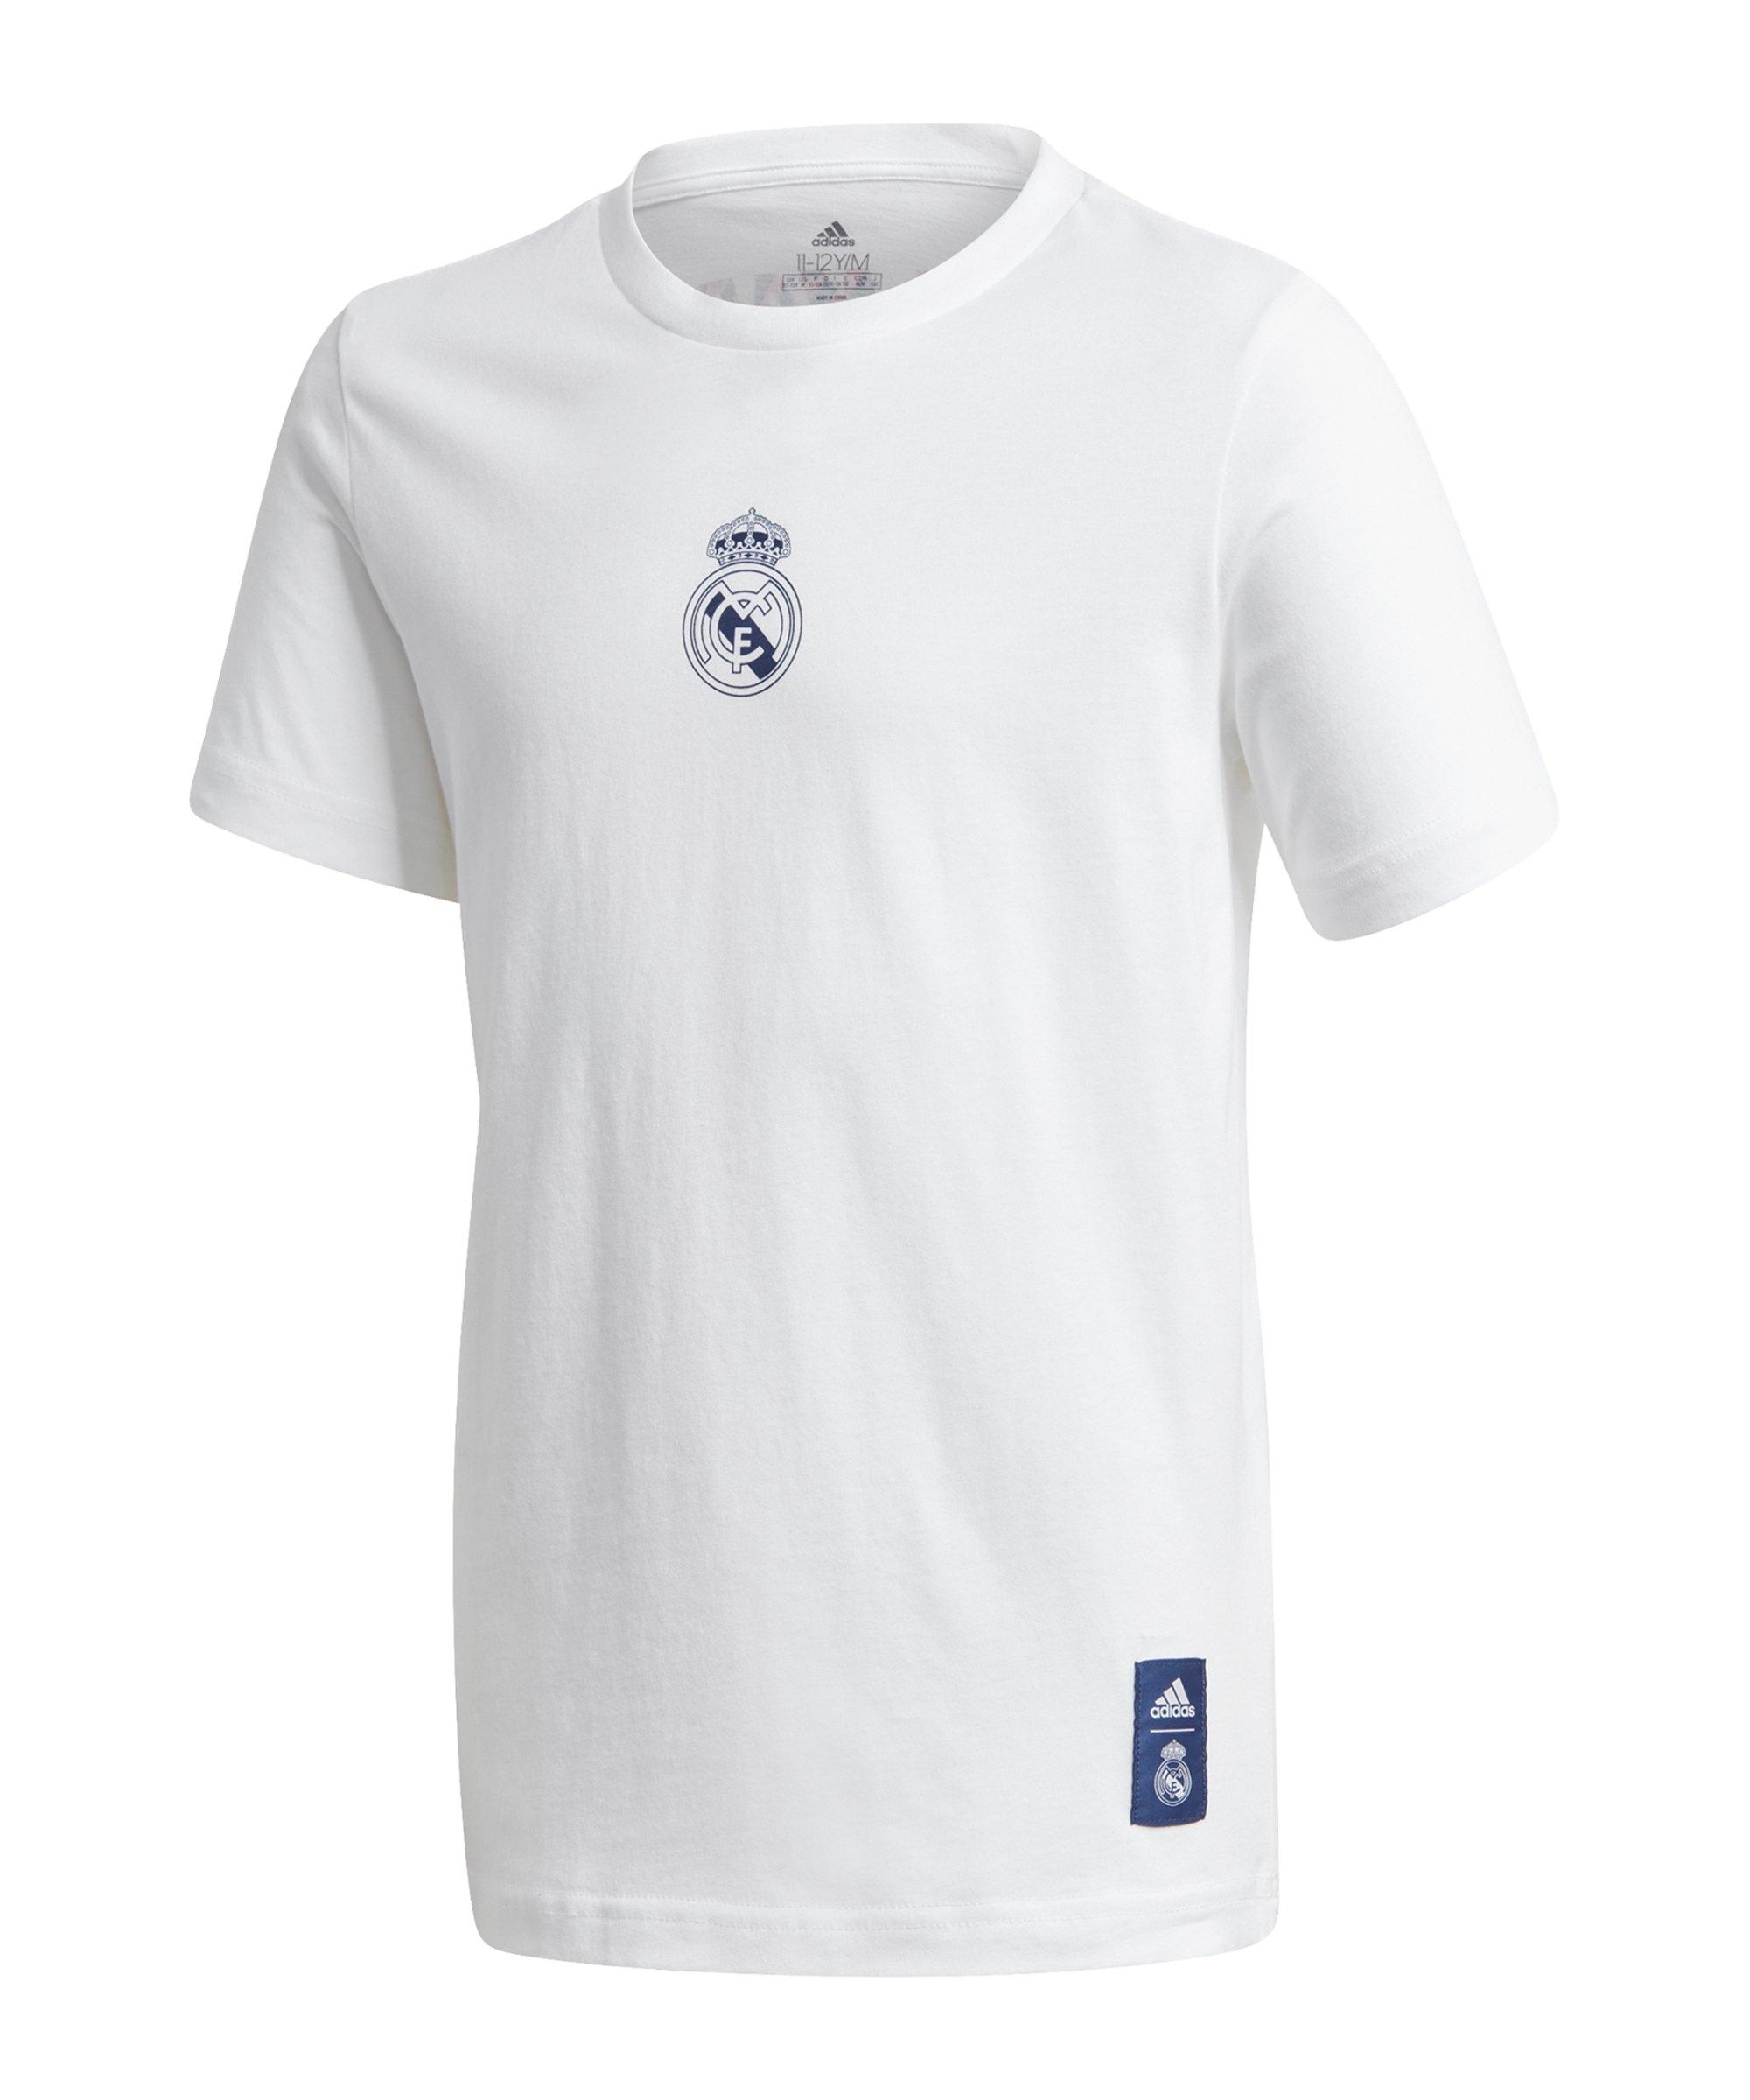 adidas Real Madrid Graphic T-Shirt Kids Weiss Blau - weiss